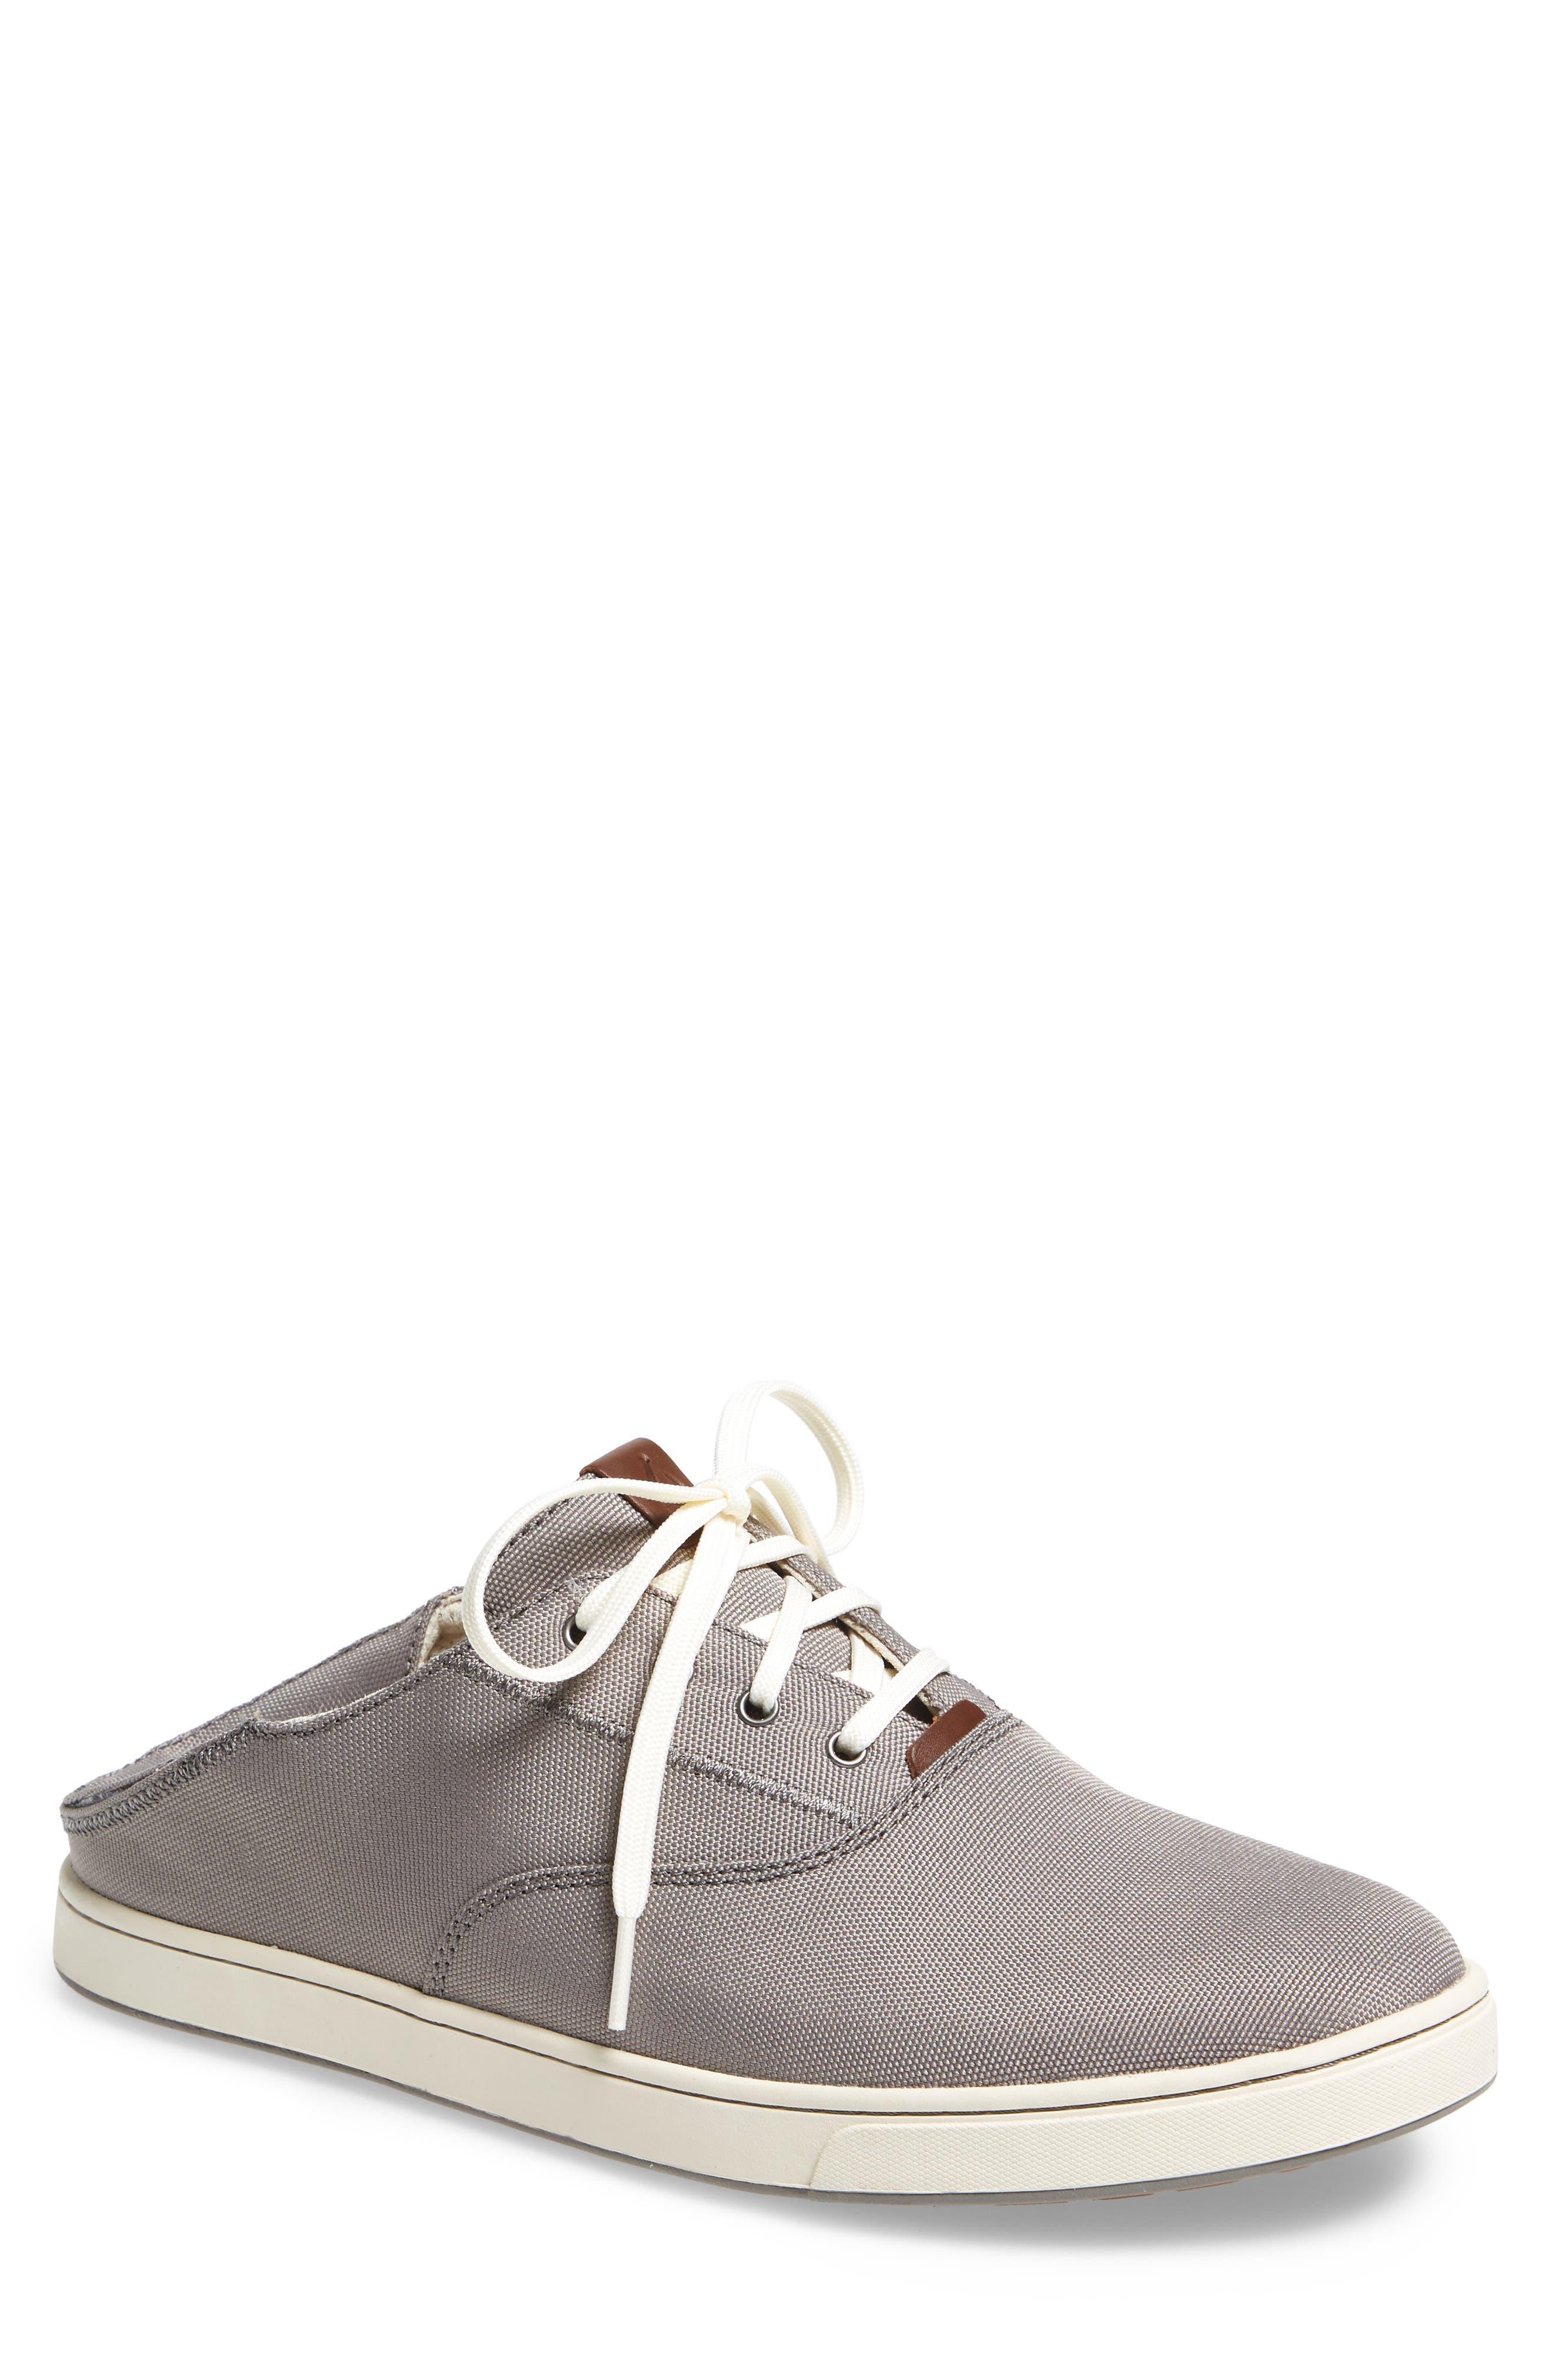 OluKai Kahu Collapsible Lace-Up Sneaker (Men)